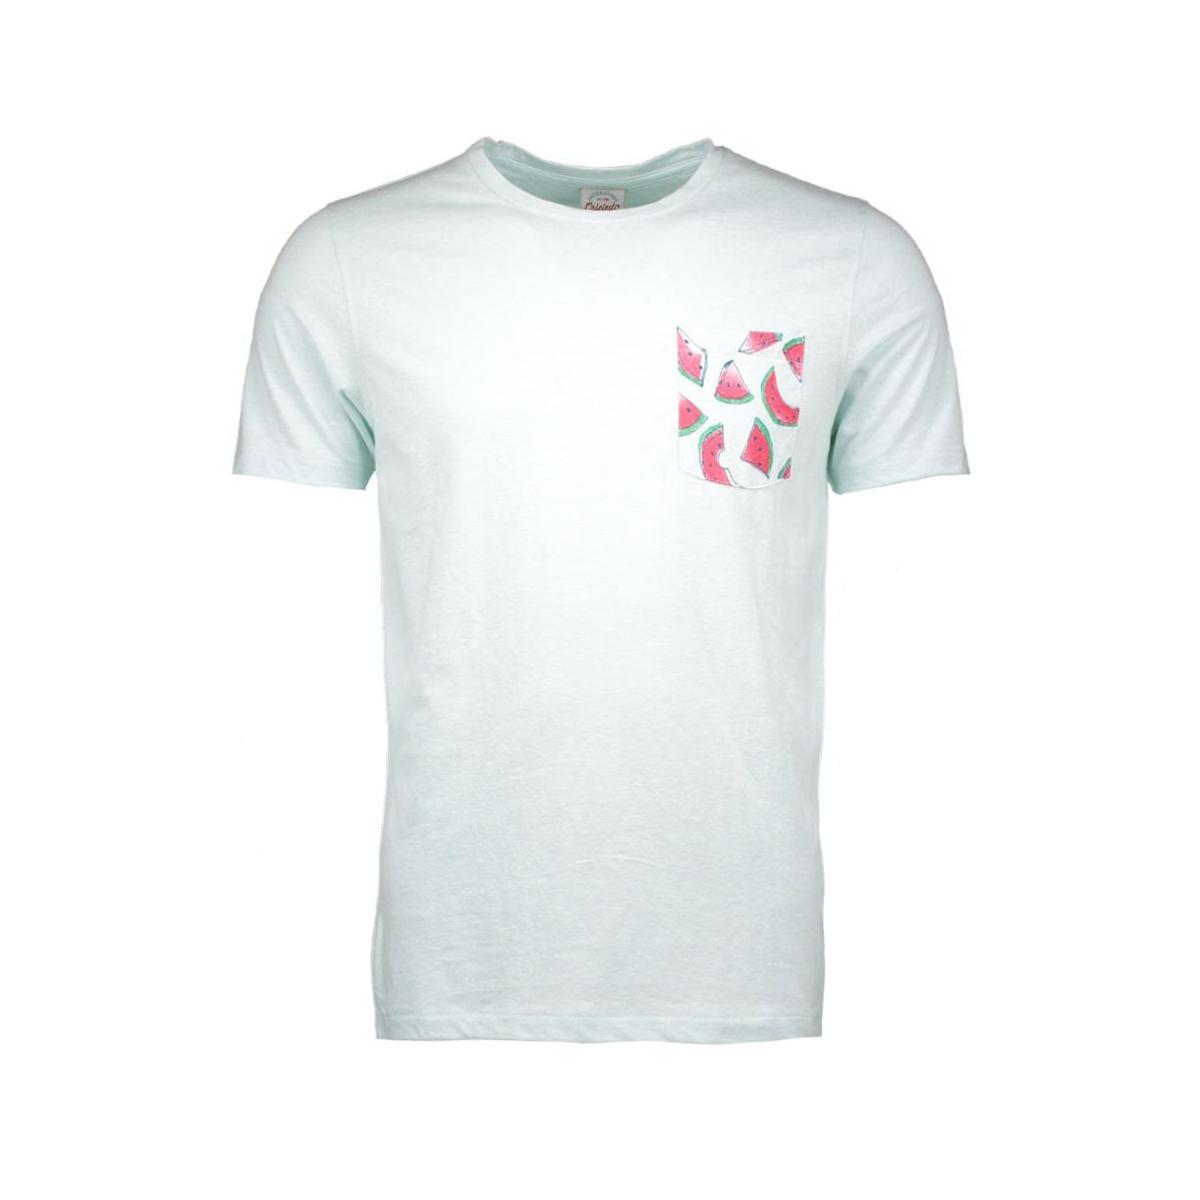 jorbobby tee 12106465 jack & jones t-shirt surf spray